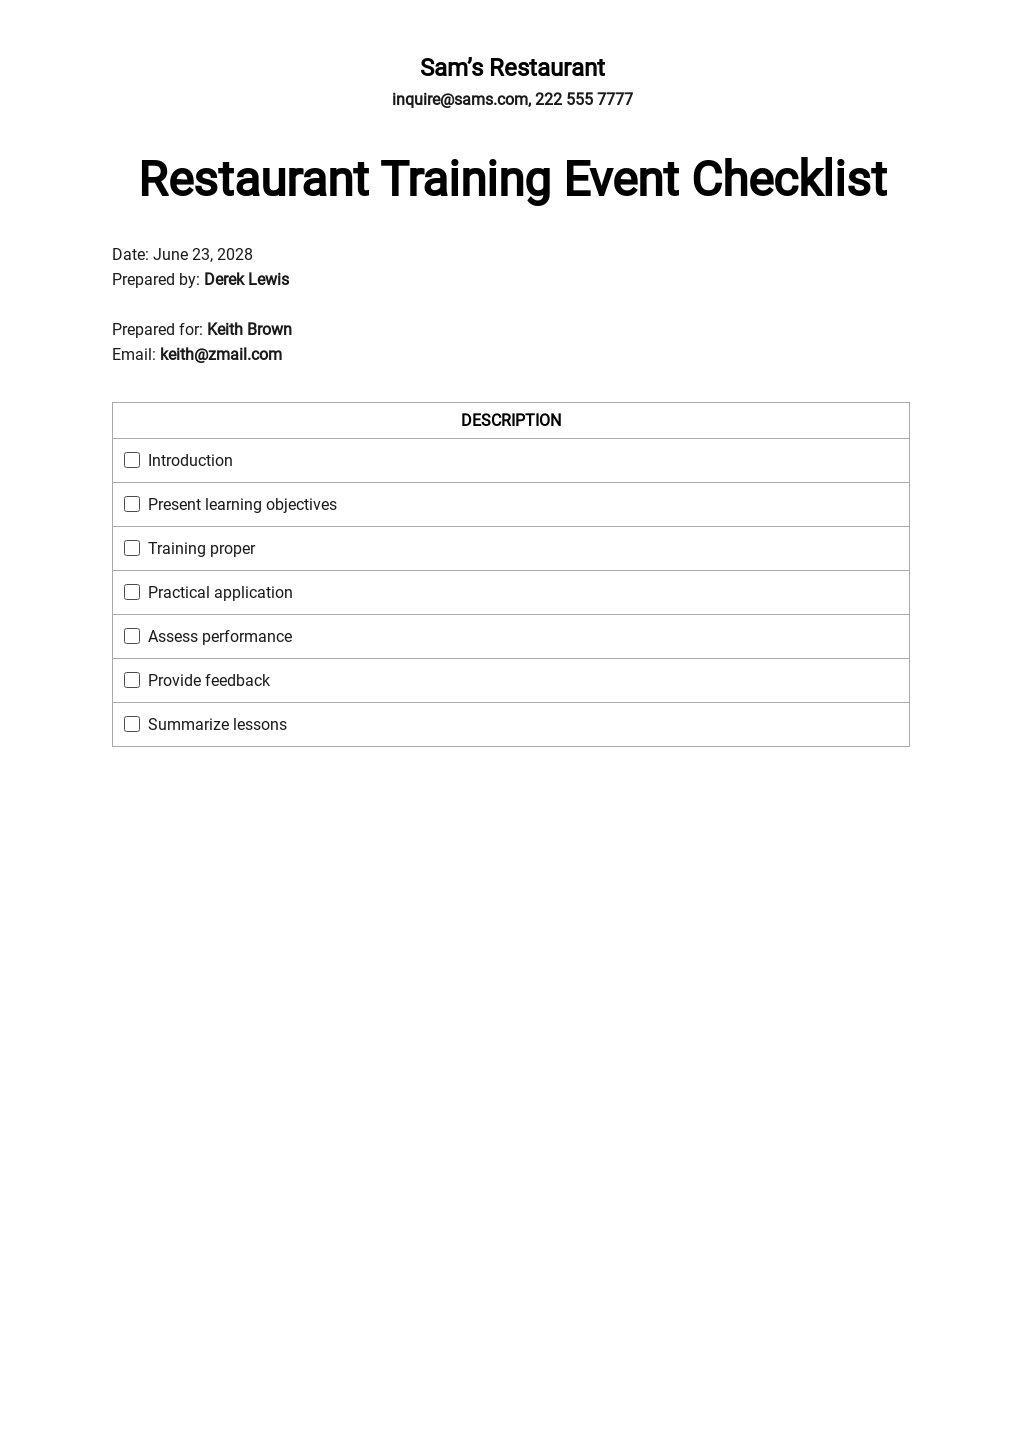 Restaurant Training Event Checklist Template